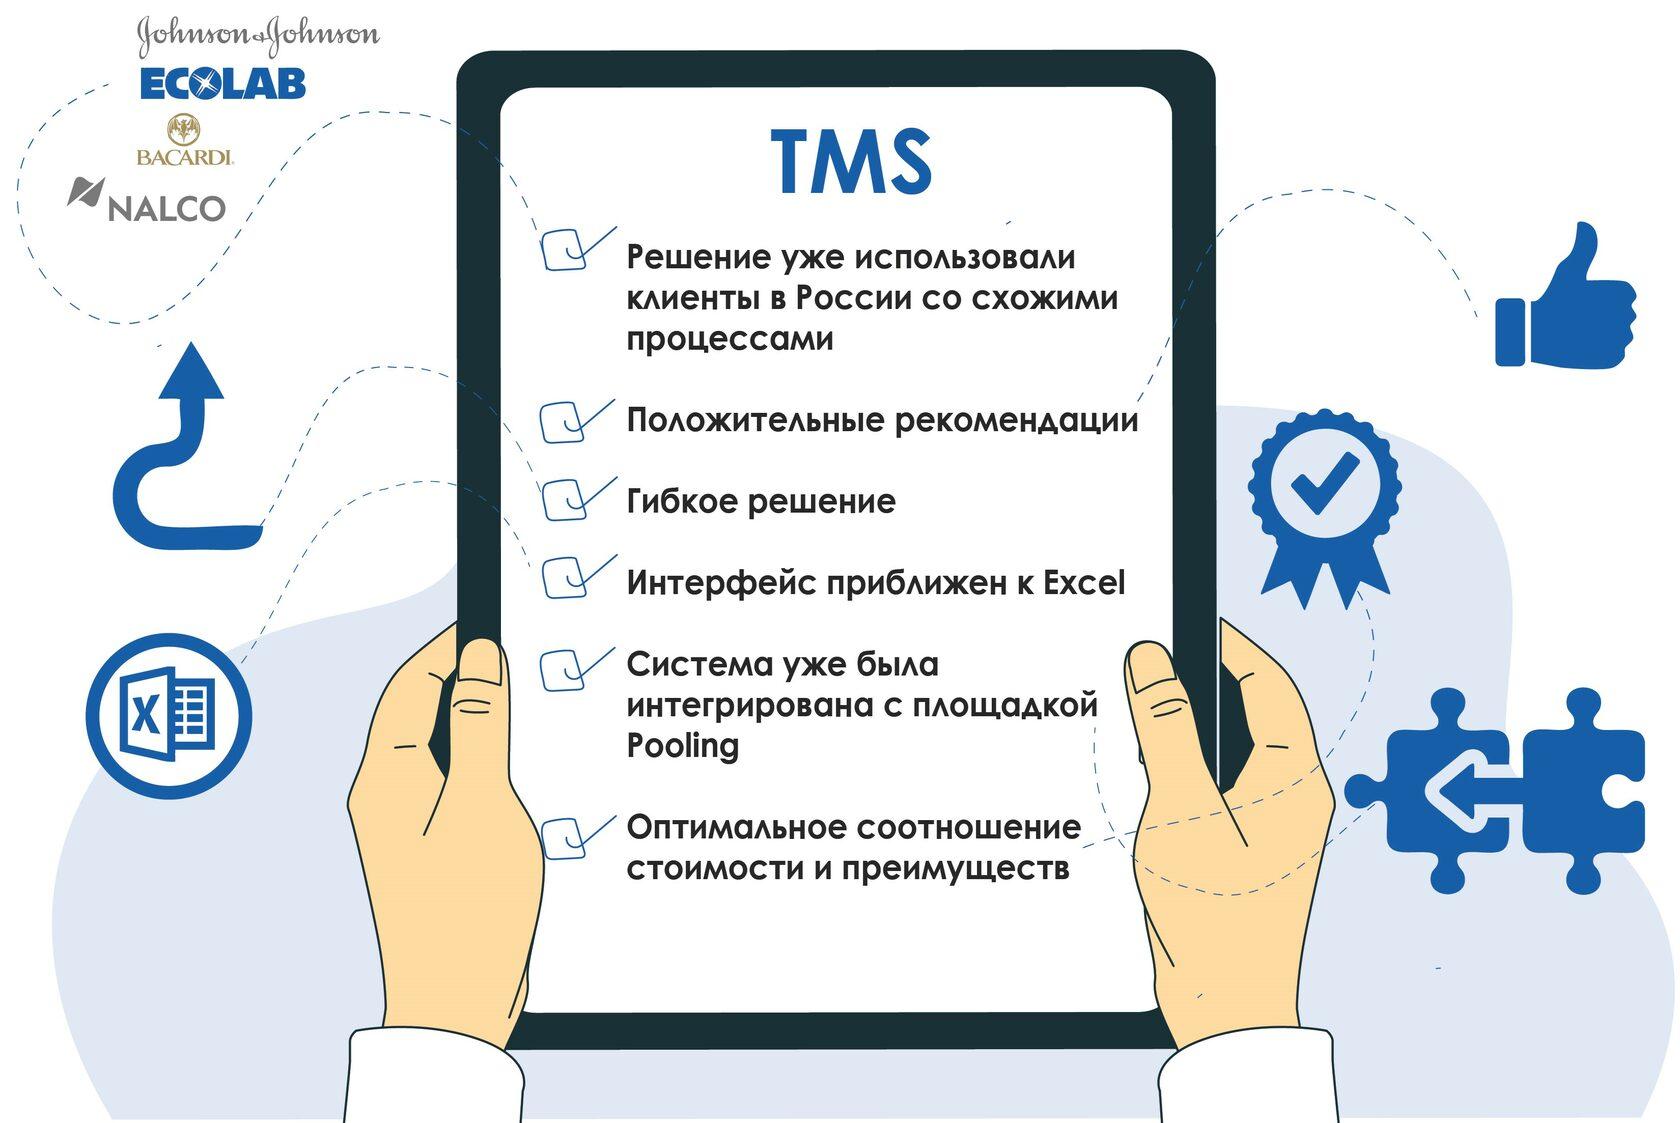 Внедрение ТМС